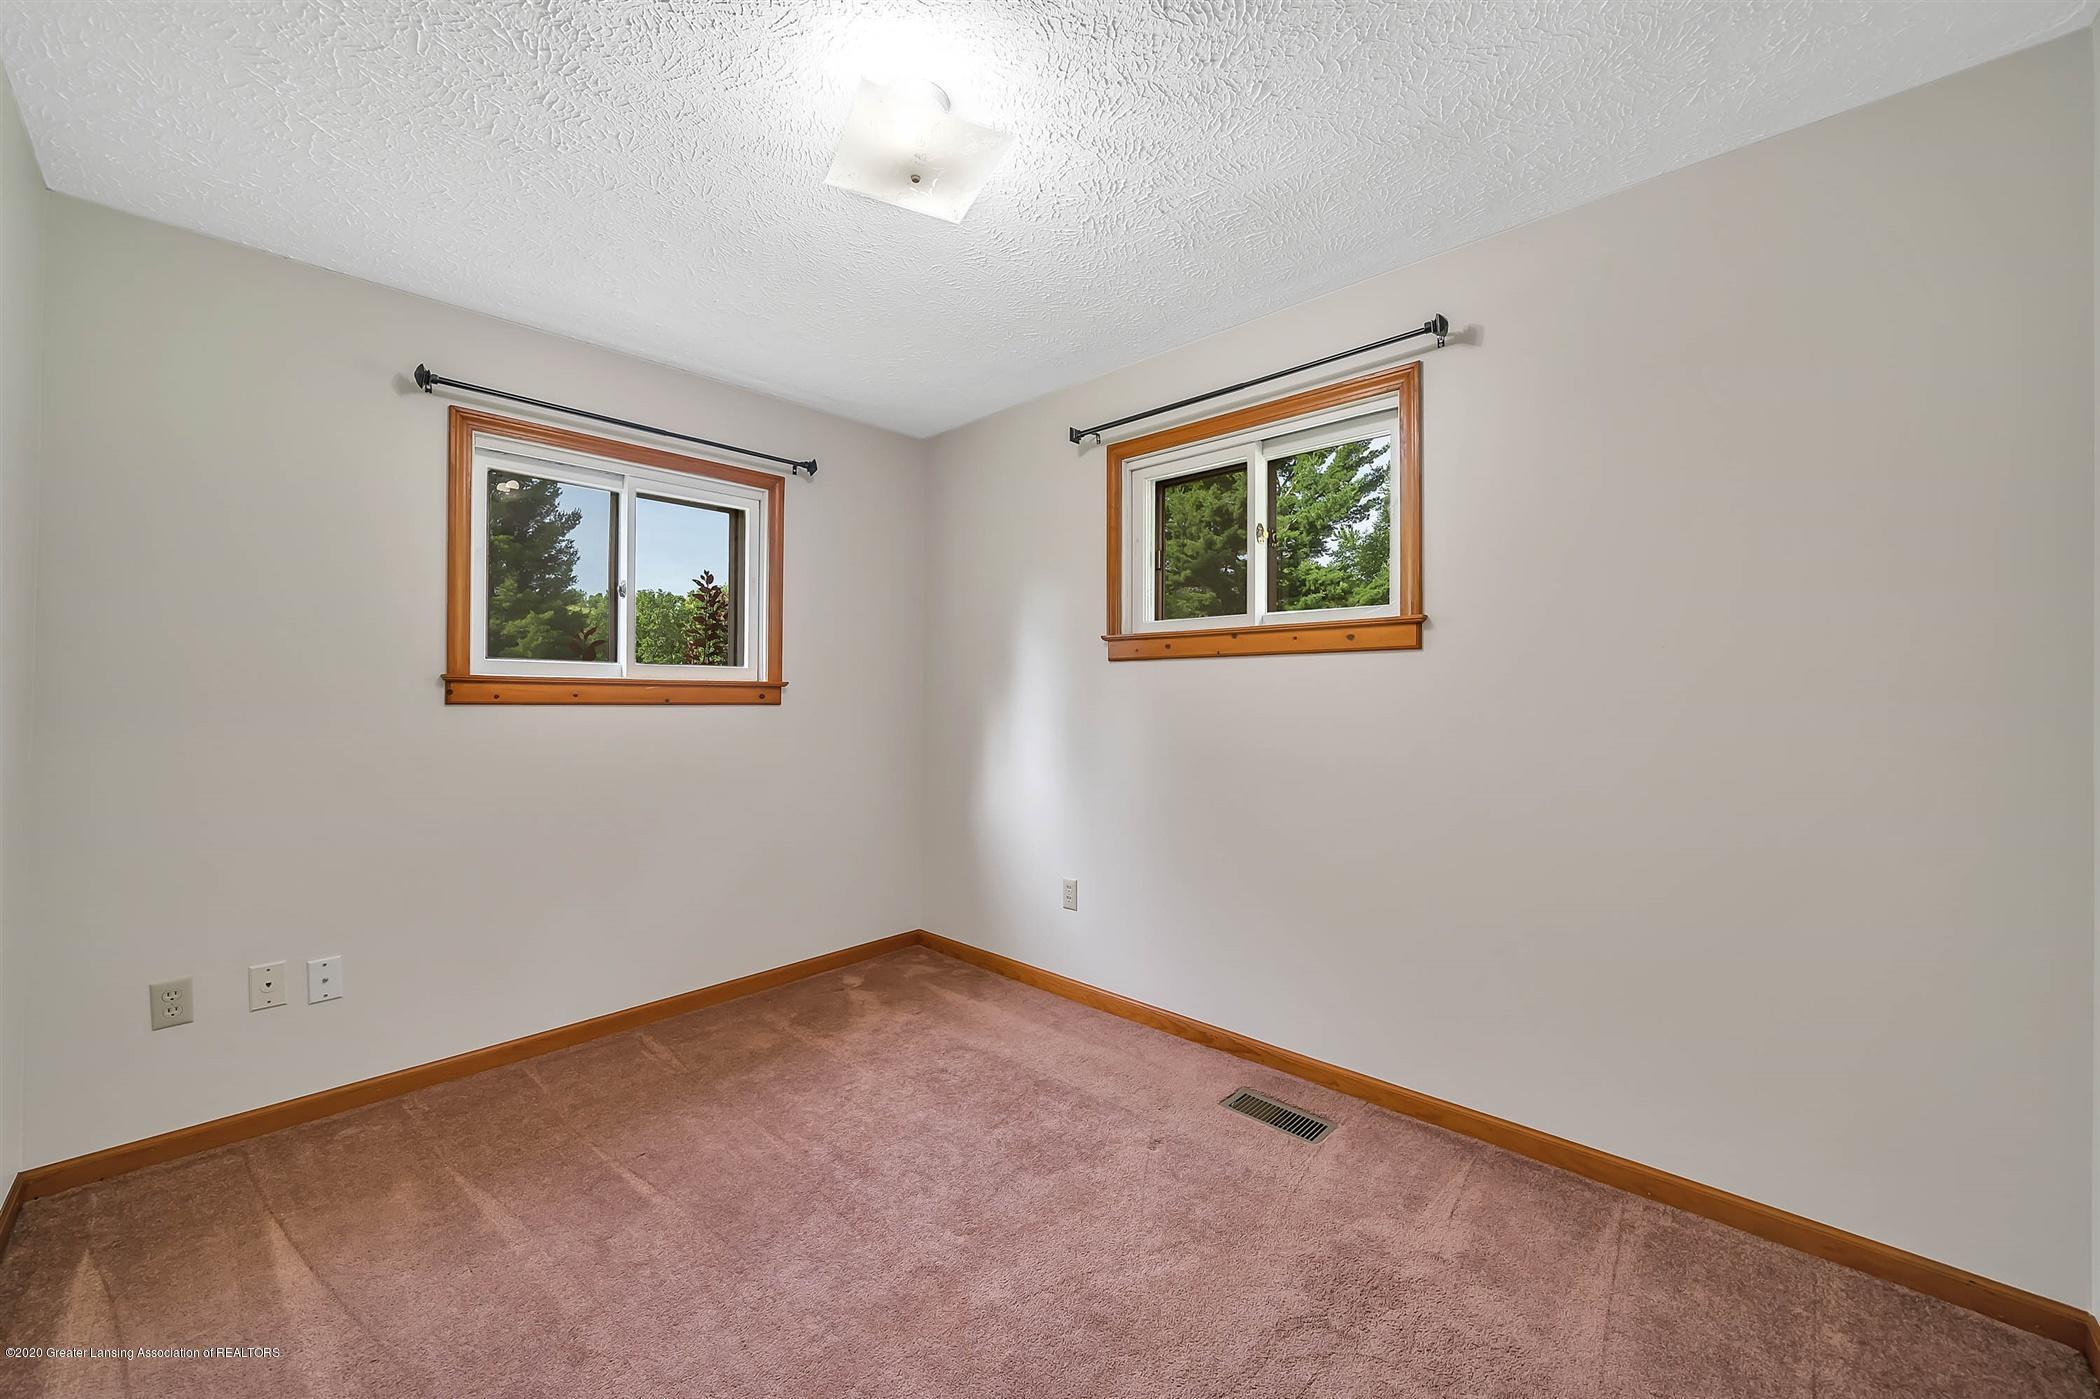 6750 W Lovejoy Rd - (31) 6756 Lovejoy Bedroom 2 - 31